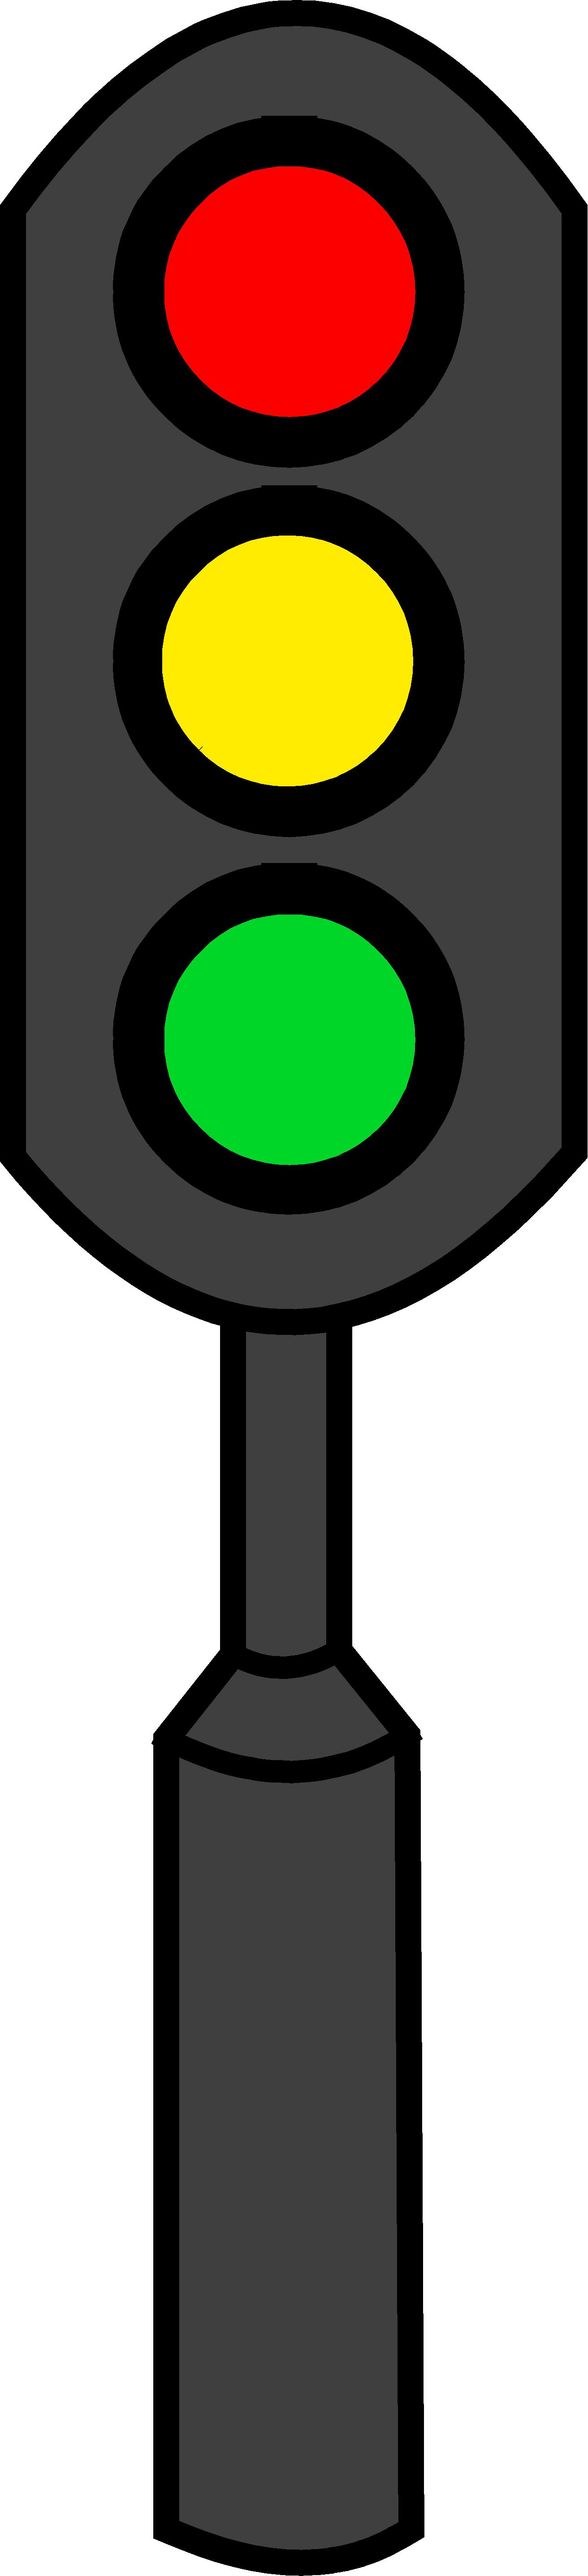 traffic light pinterest traffic light graphics and rh pinterest com